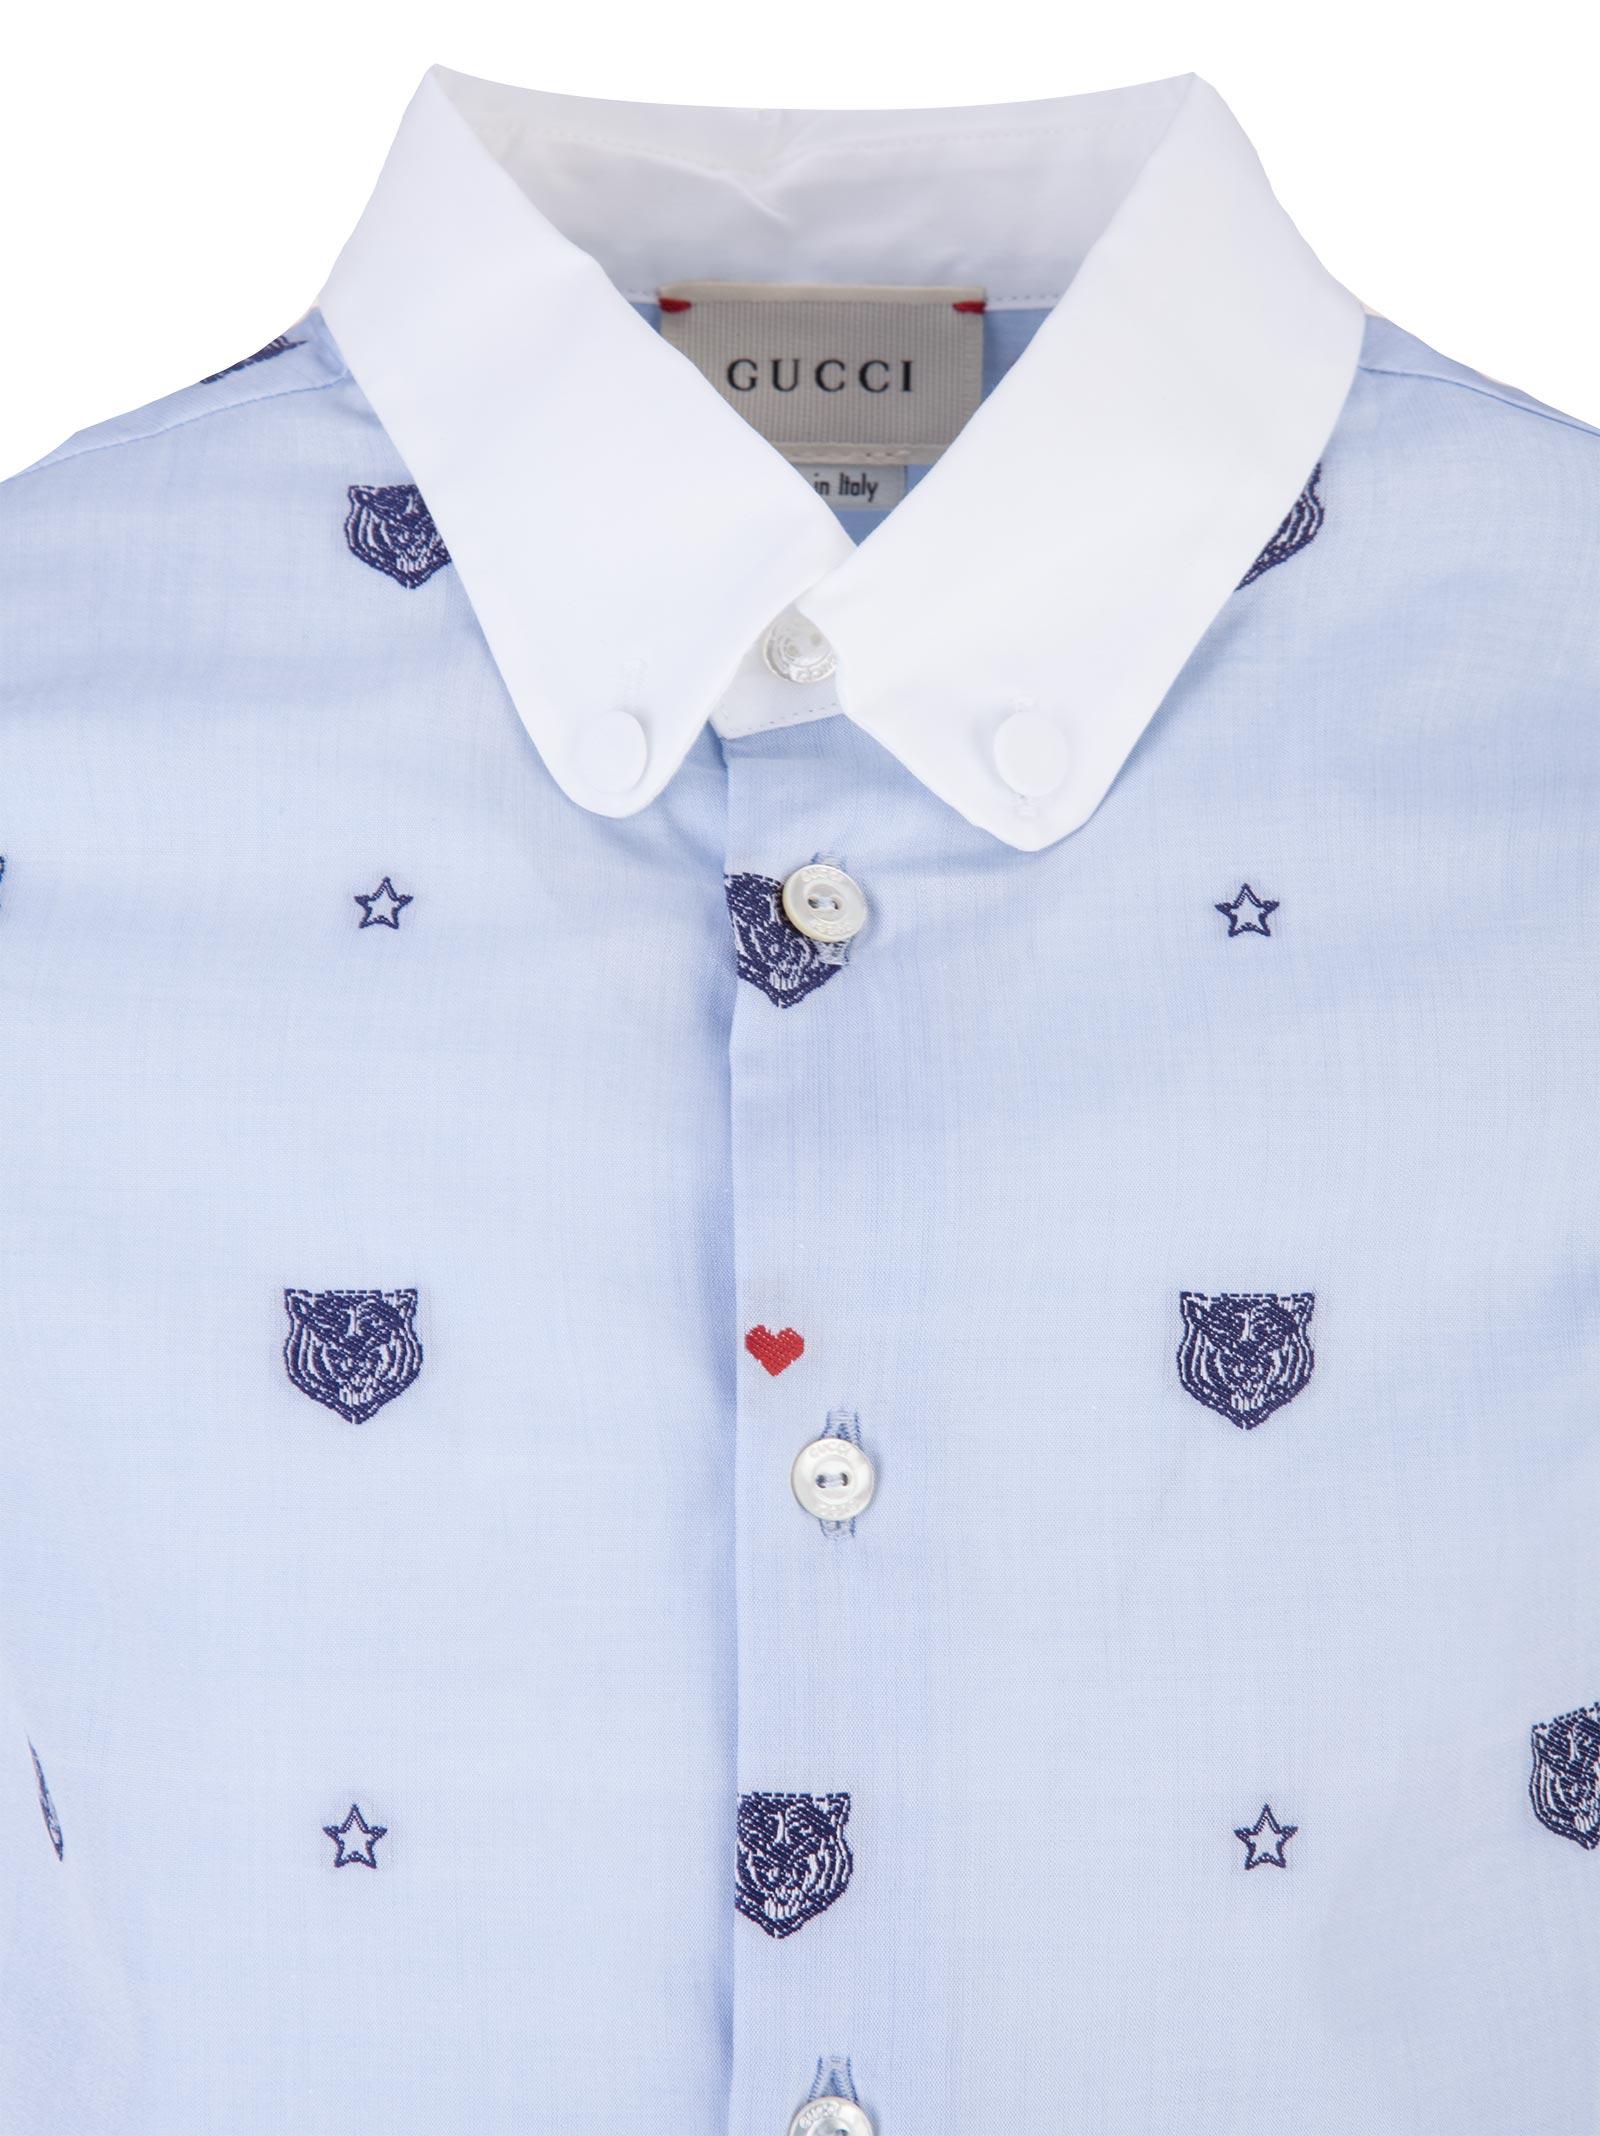 7912e0862d Gucci Junior shirt - Gucci Junior - Michele Franzese Moda